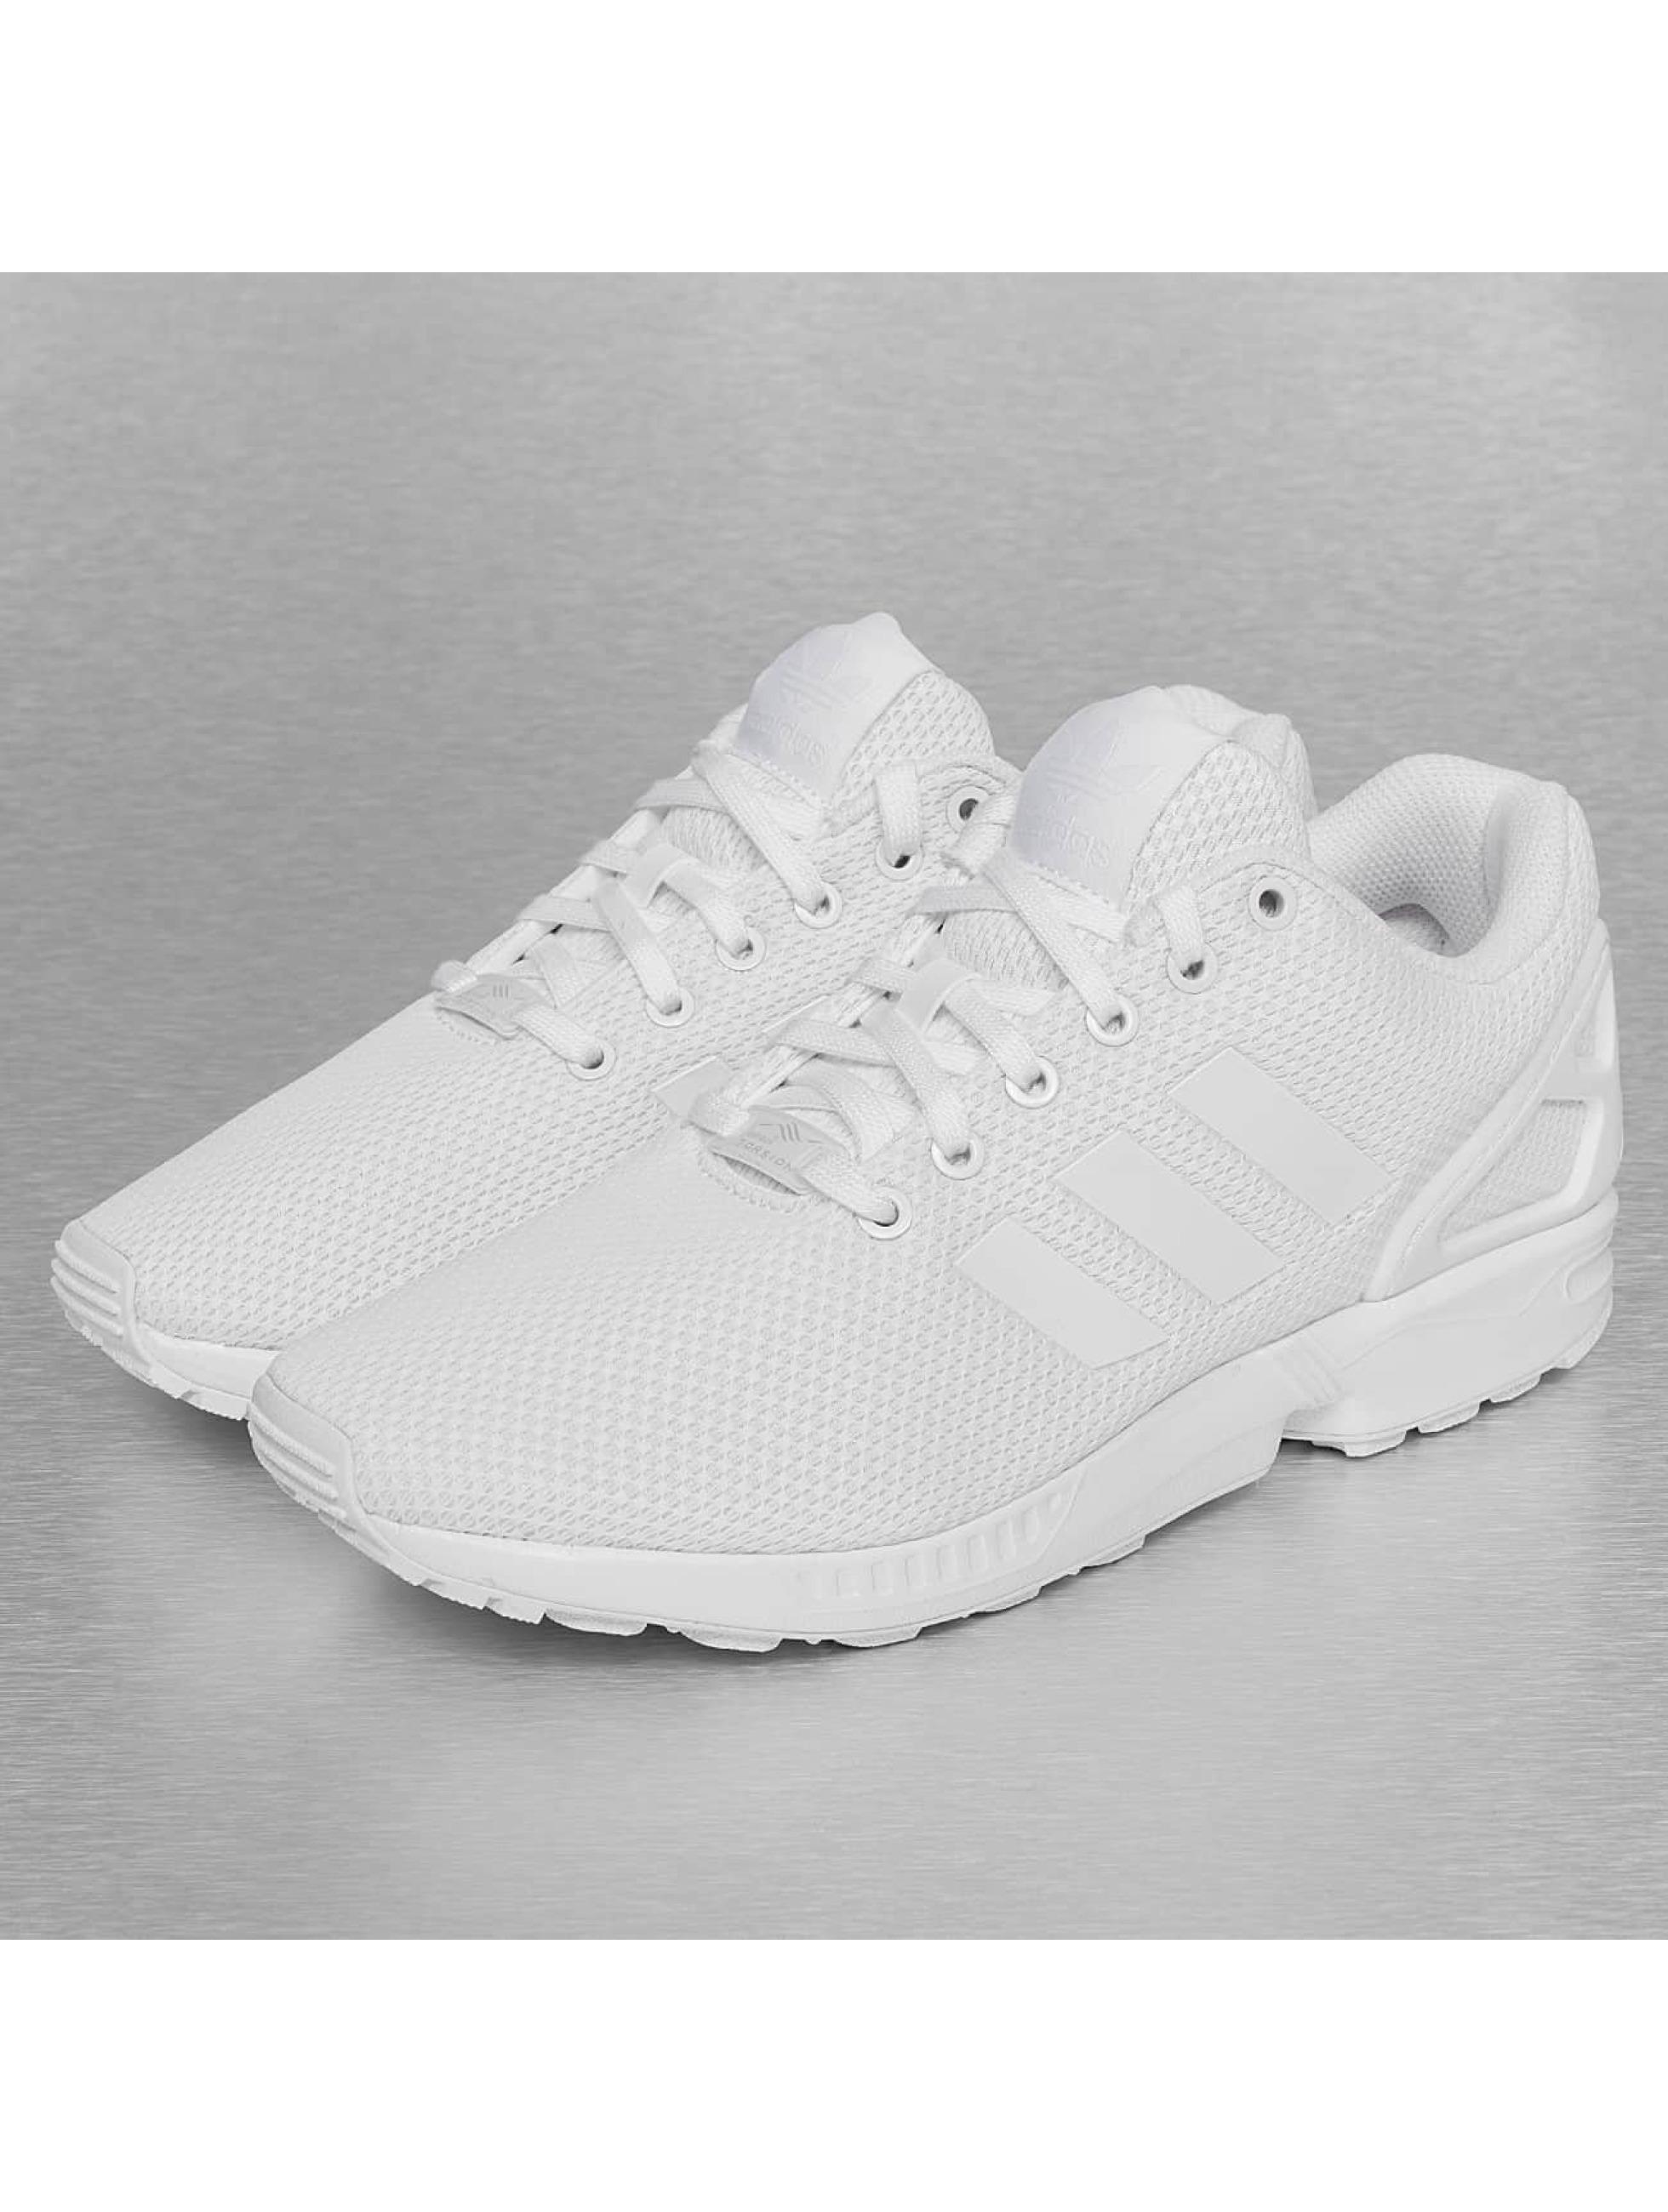 adidas Chaussures / Baskets ZX Flux en blanc